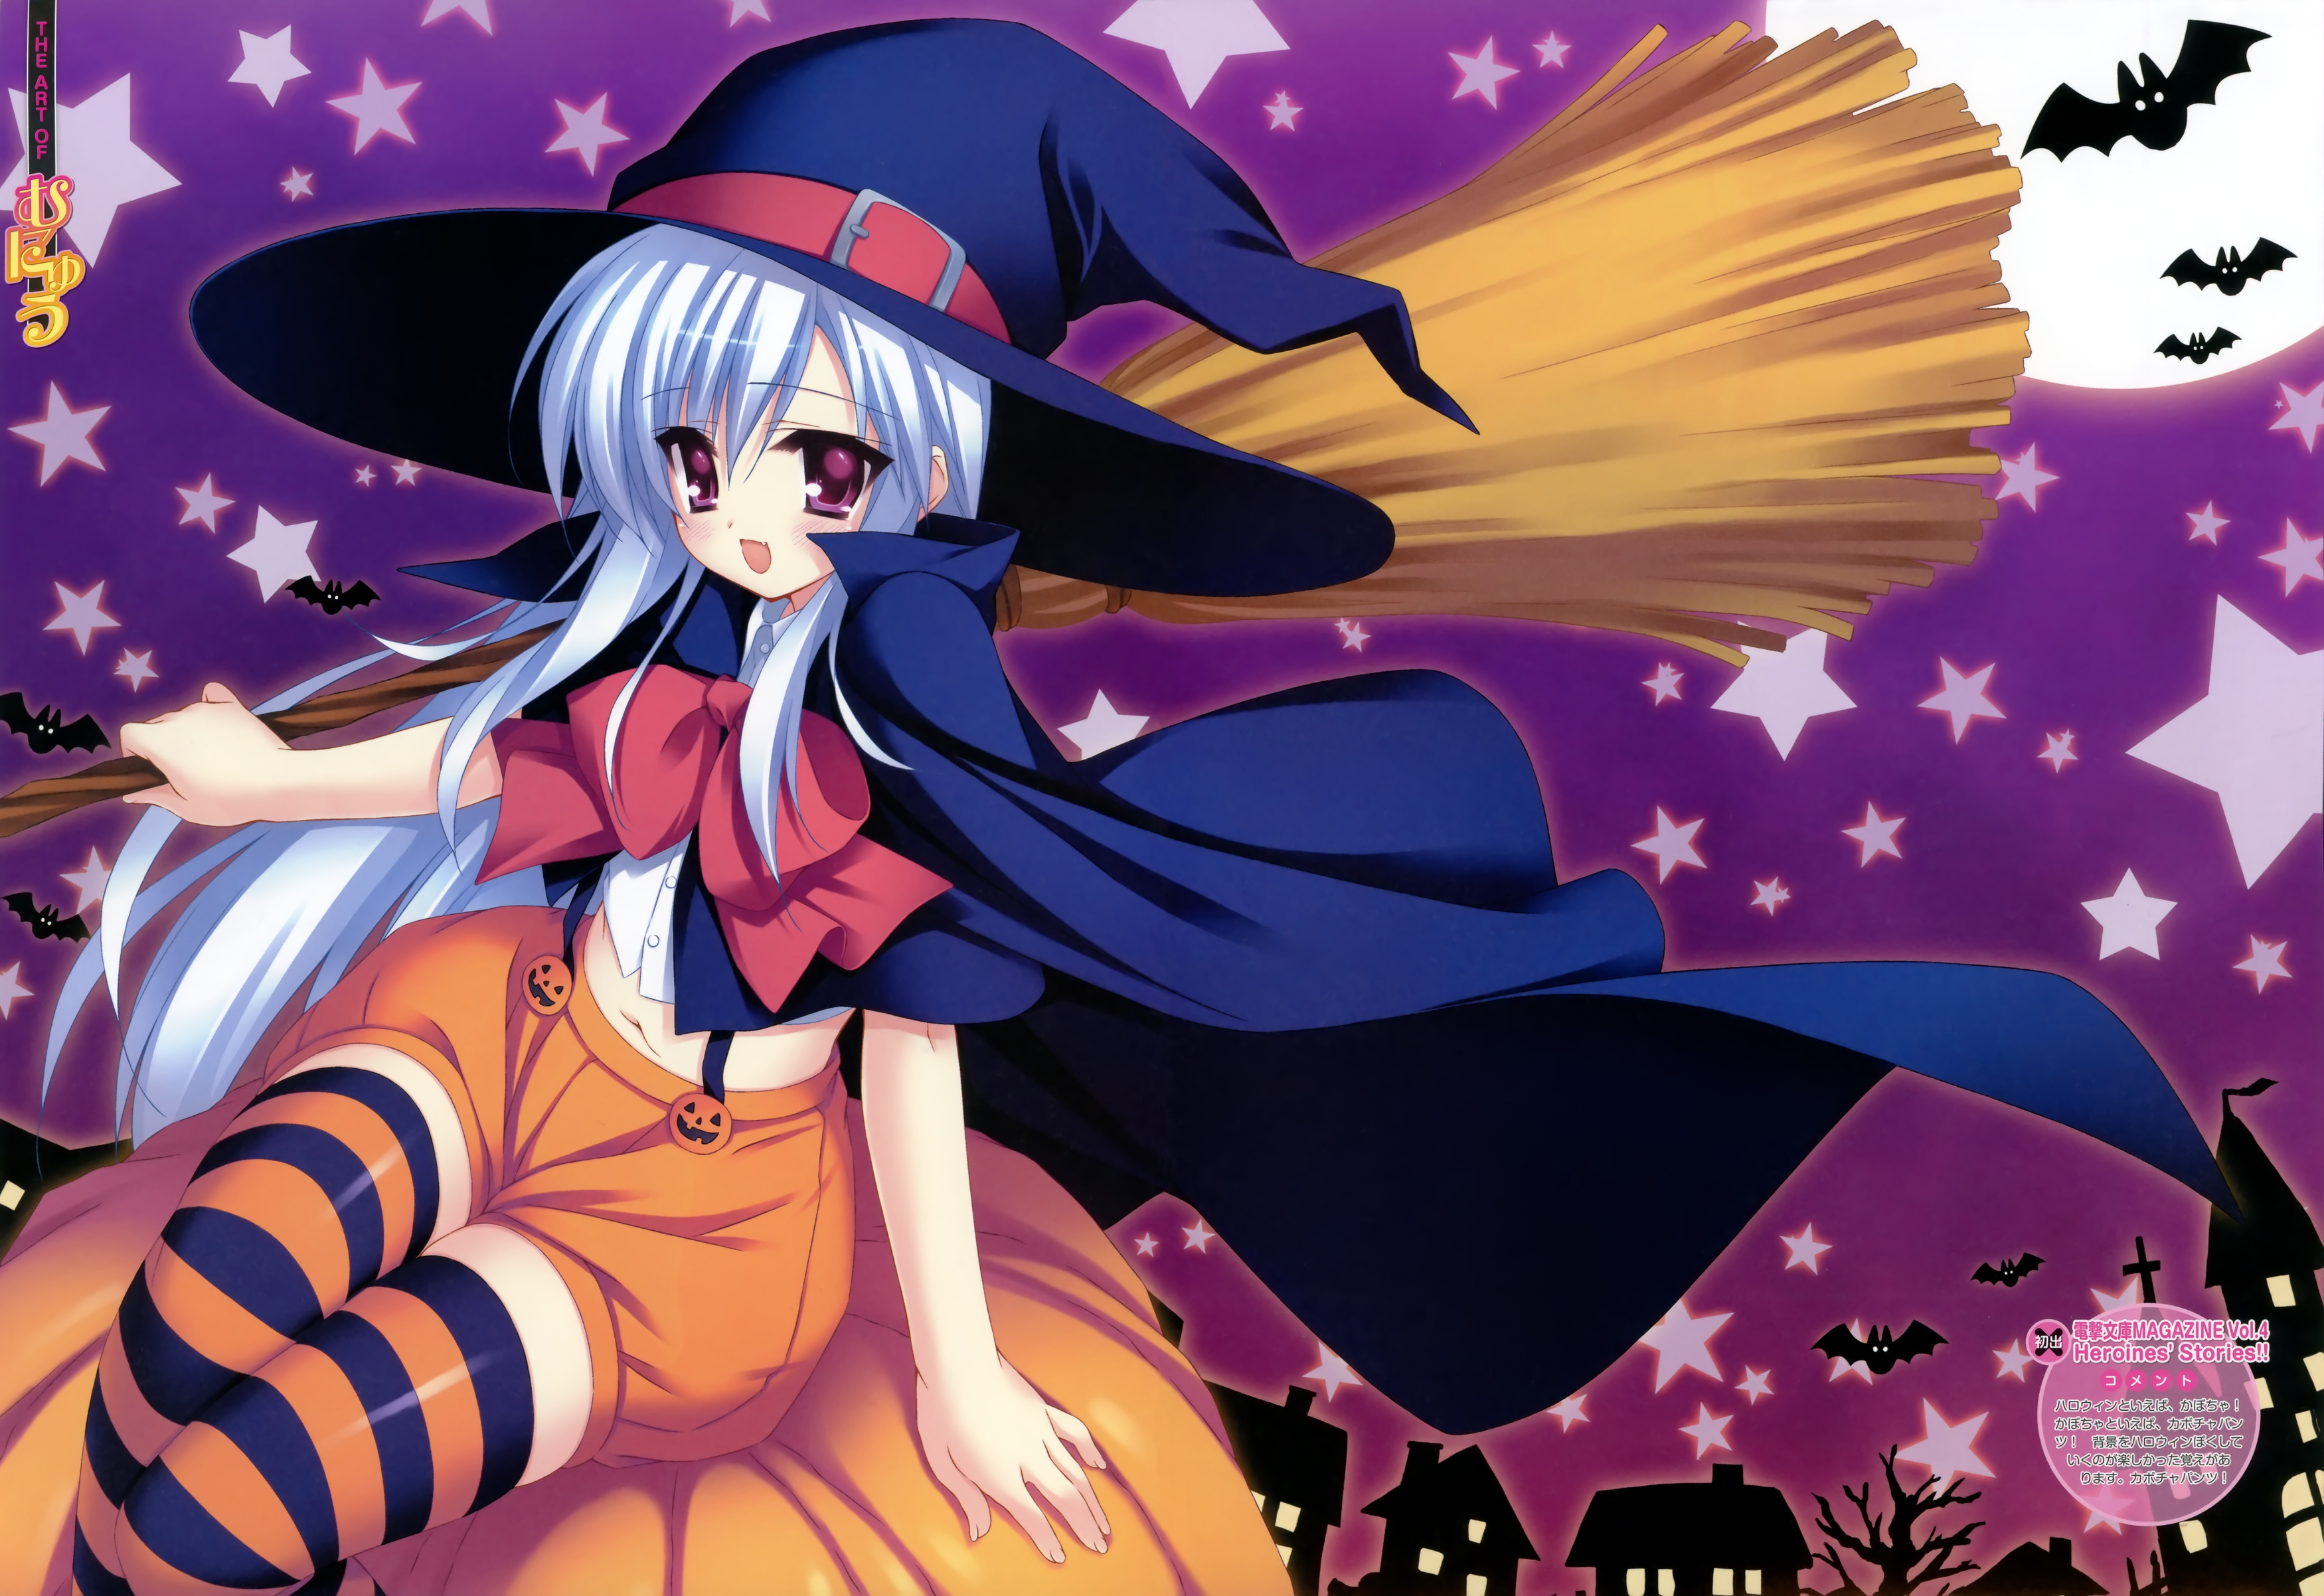 Cute Halloween Anime Girl 3500x2404 Wallpaper Teahub Io